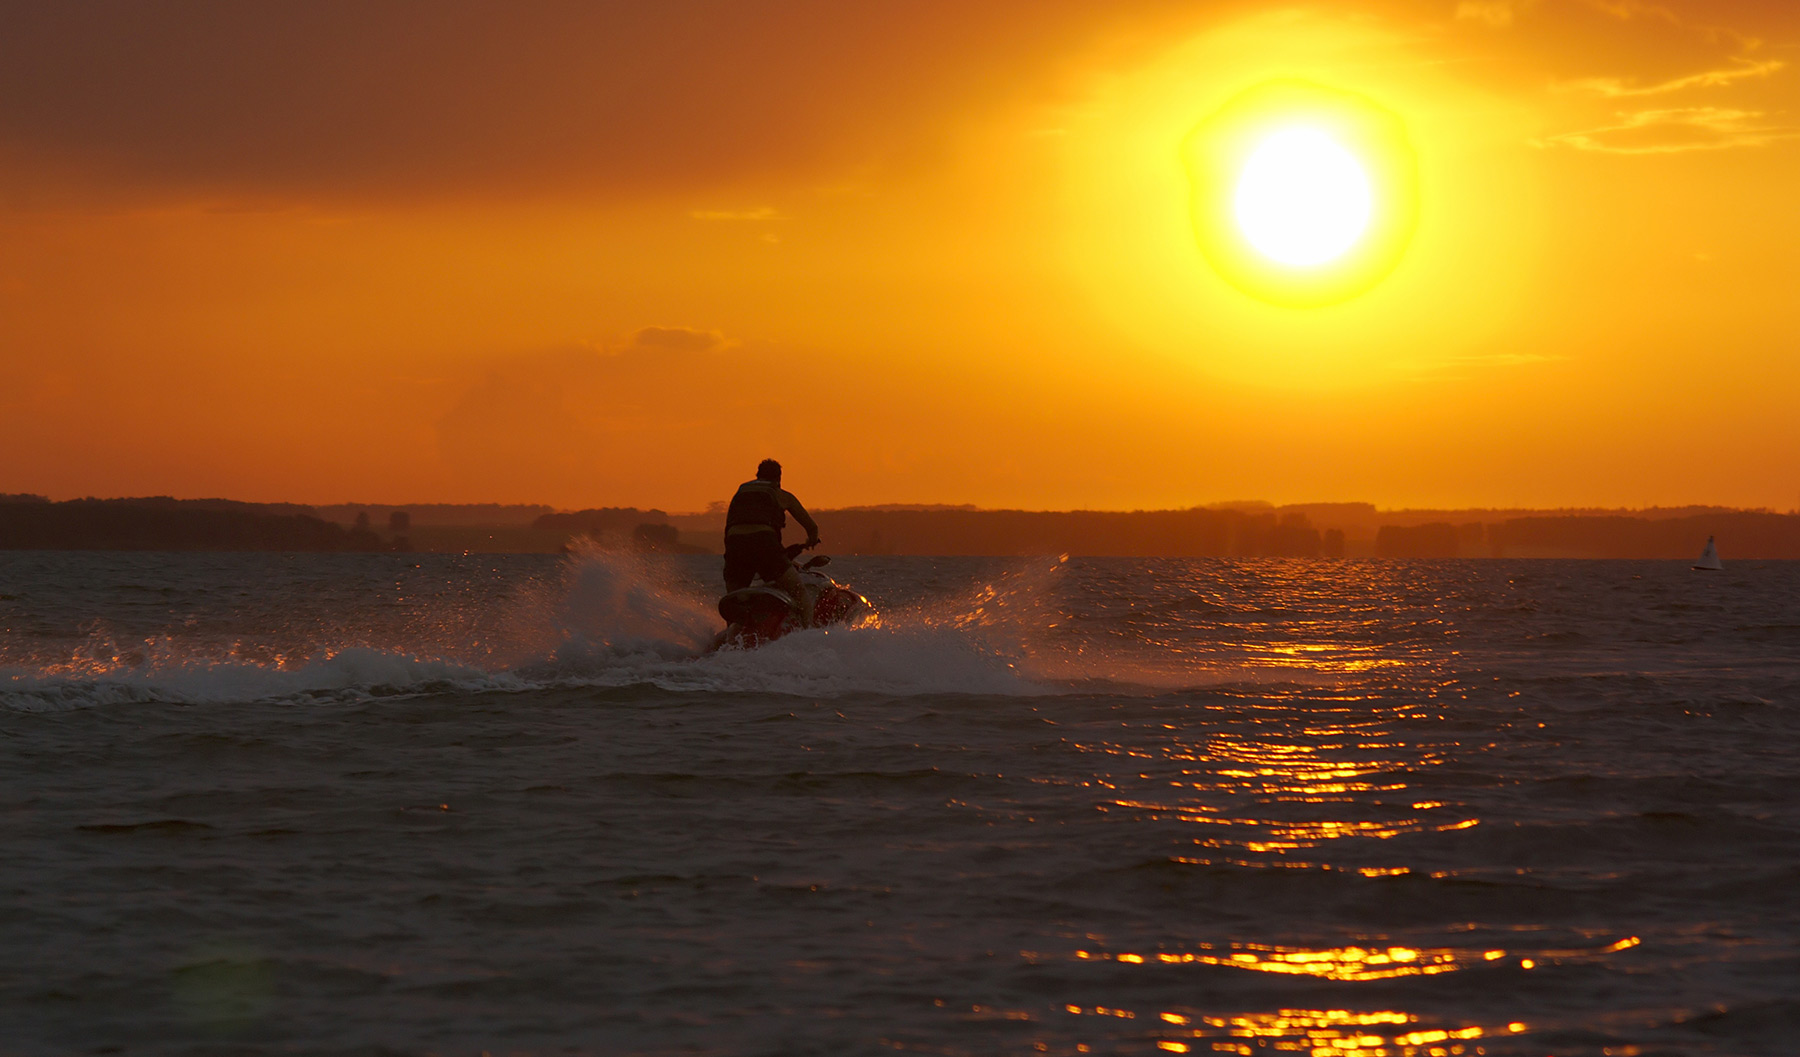 All Pro Watercraft Waverunner Repair | Boat Sales | Outboard Motors | Panama City